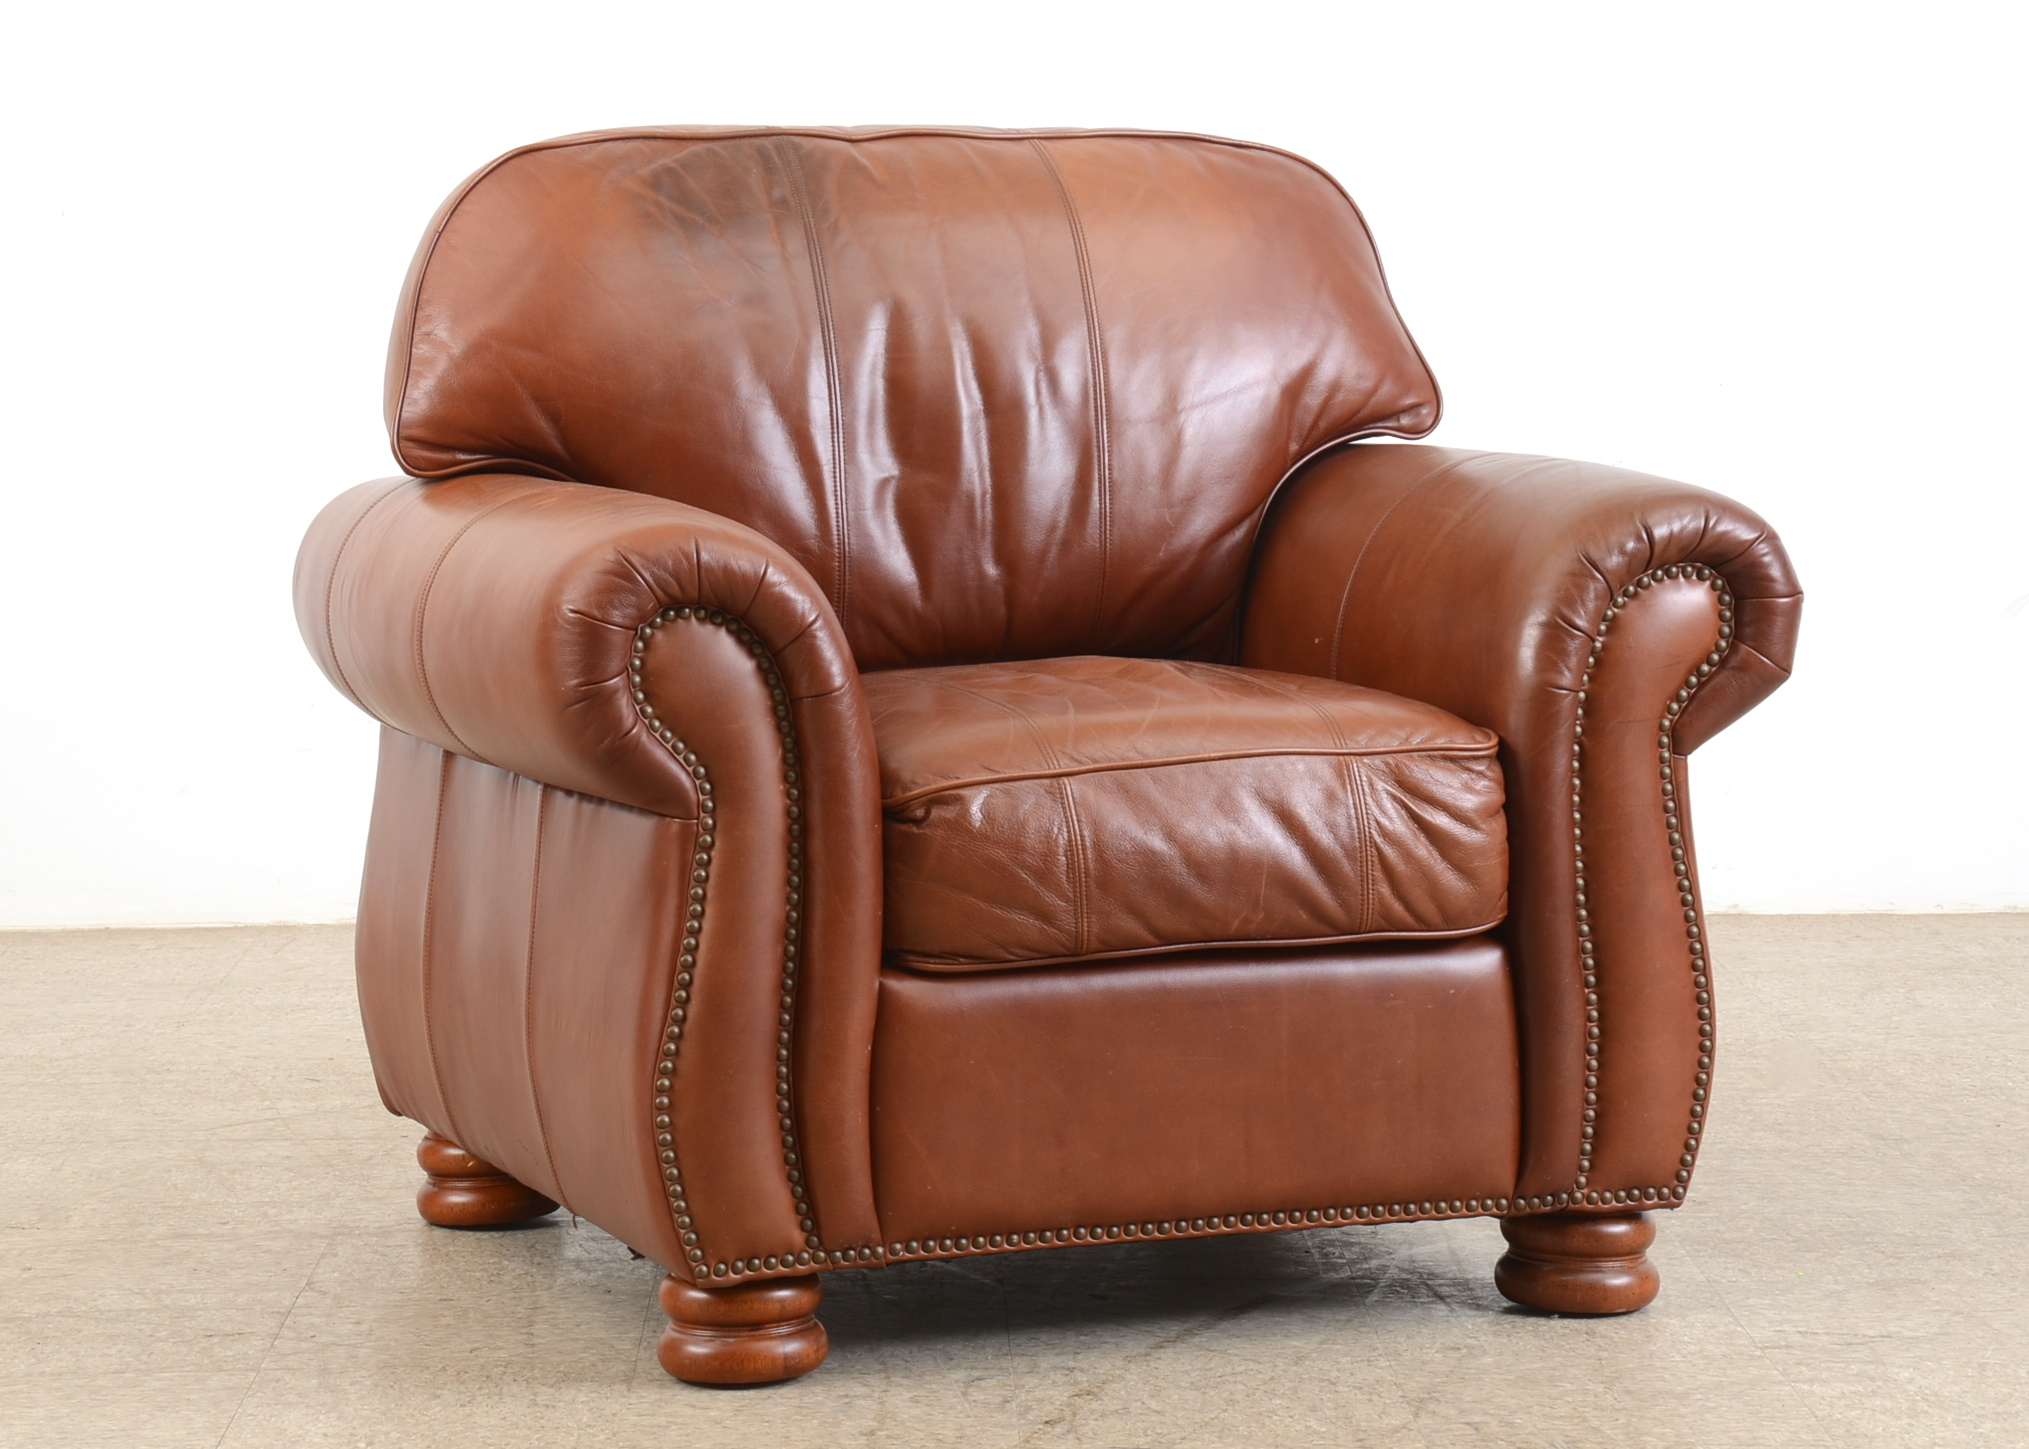 thomasville leather chair ergonomic ebth